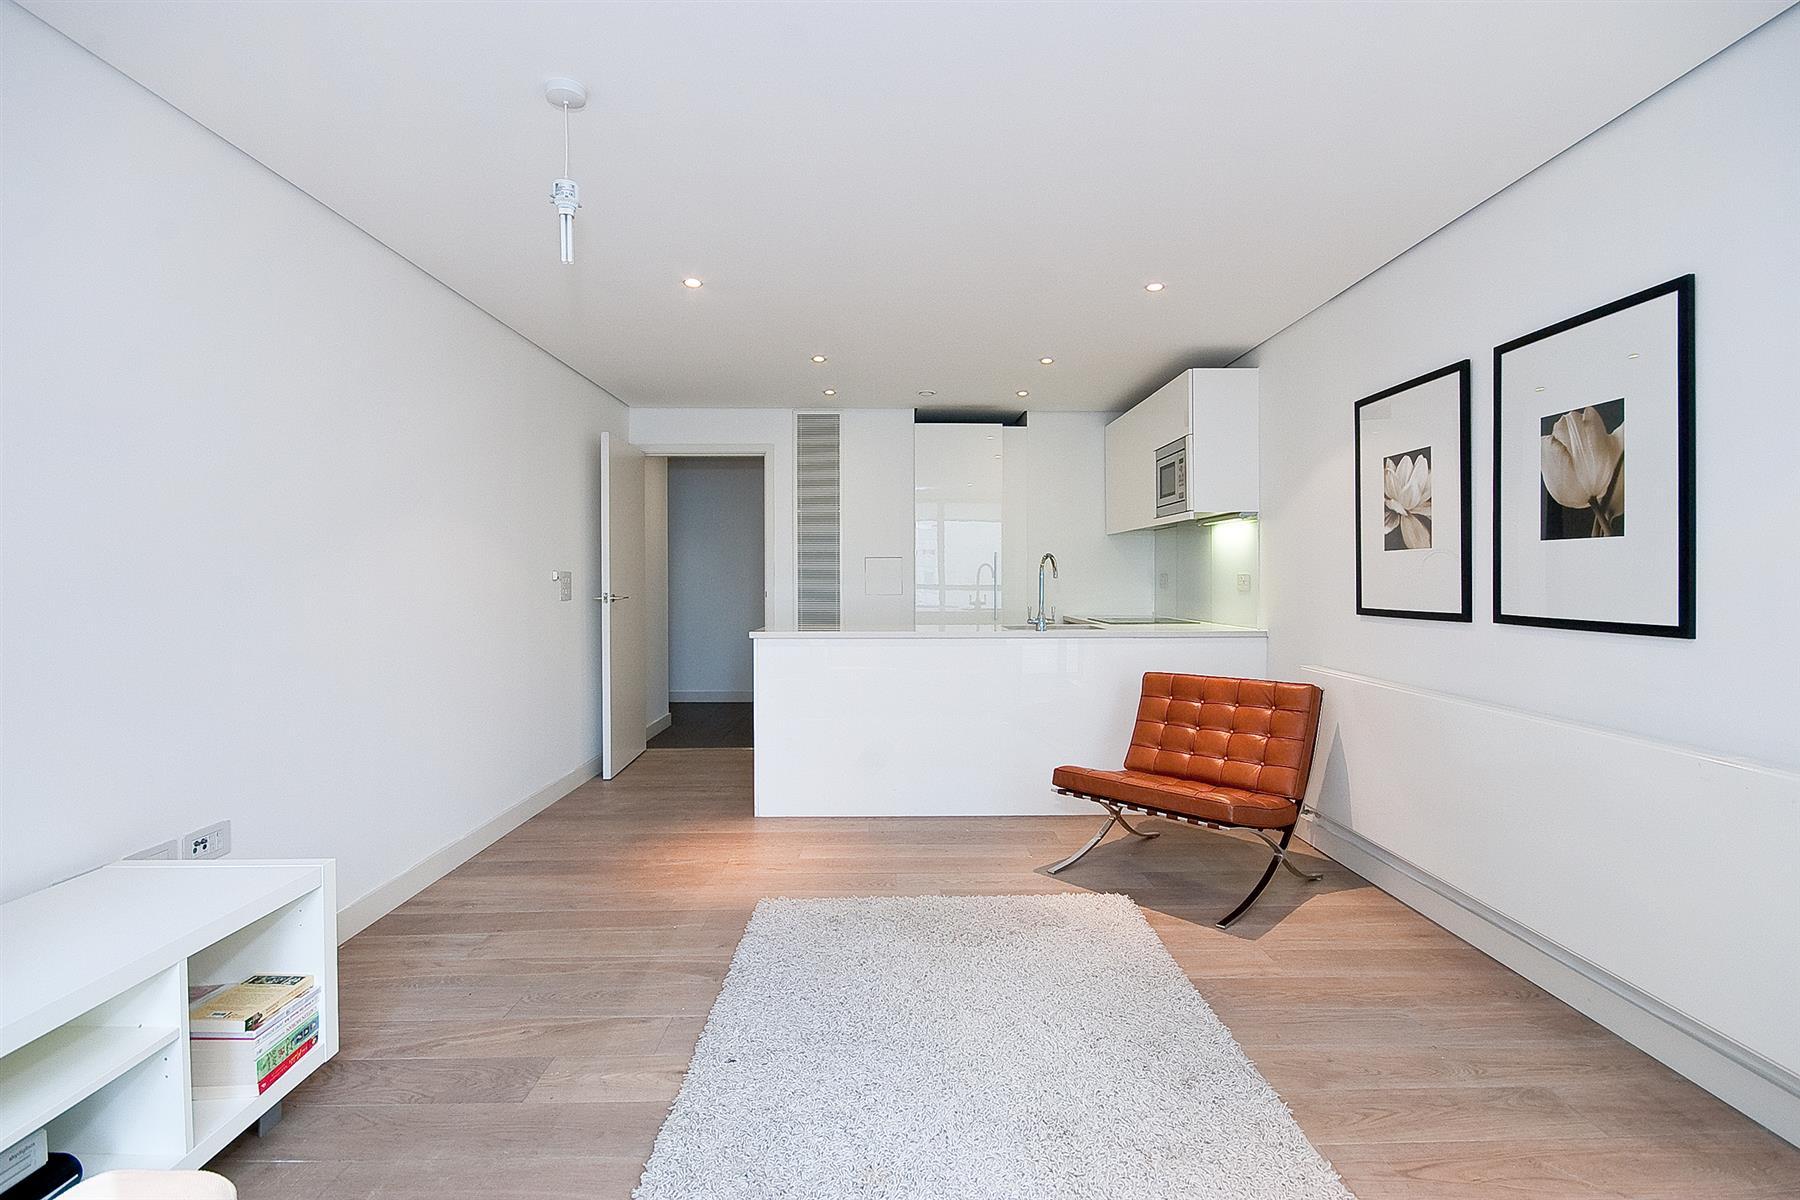 Properties For Sale 2 Bedroom Apartment 4 Merchant Square East Paddington Basin W2 Plaza Estates